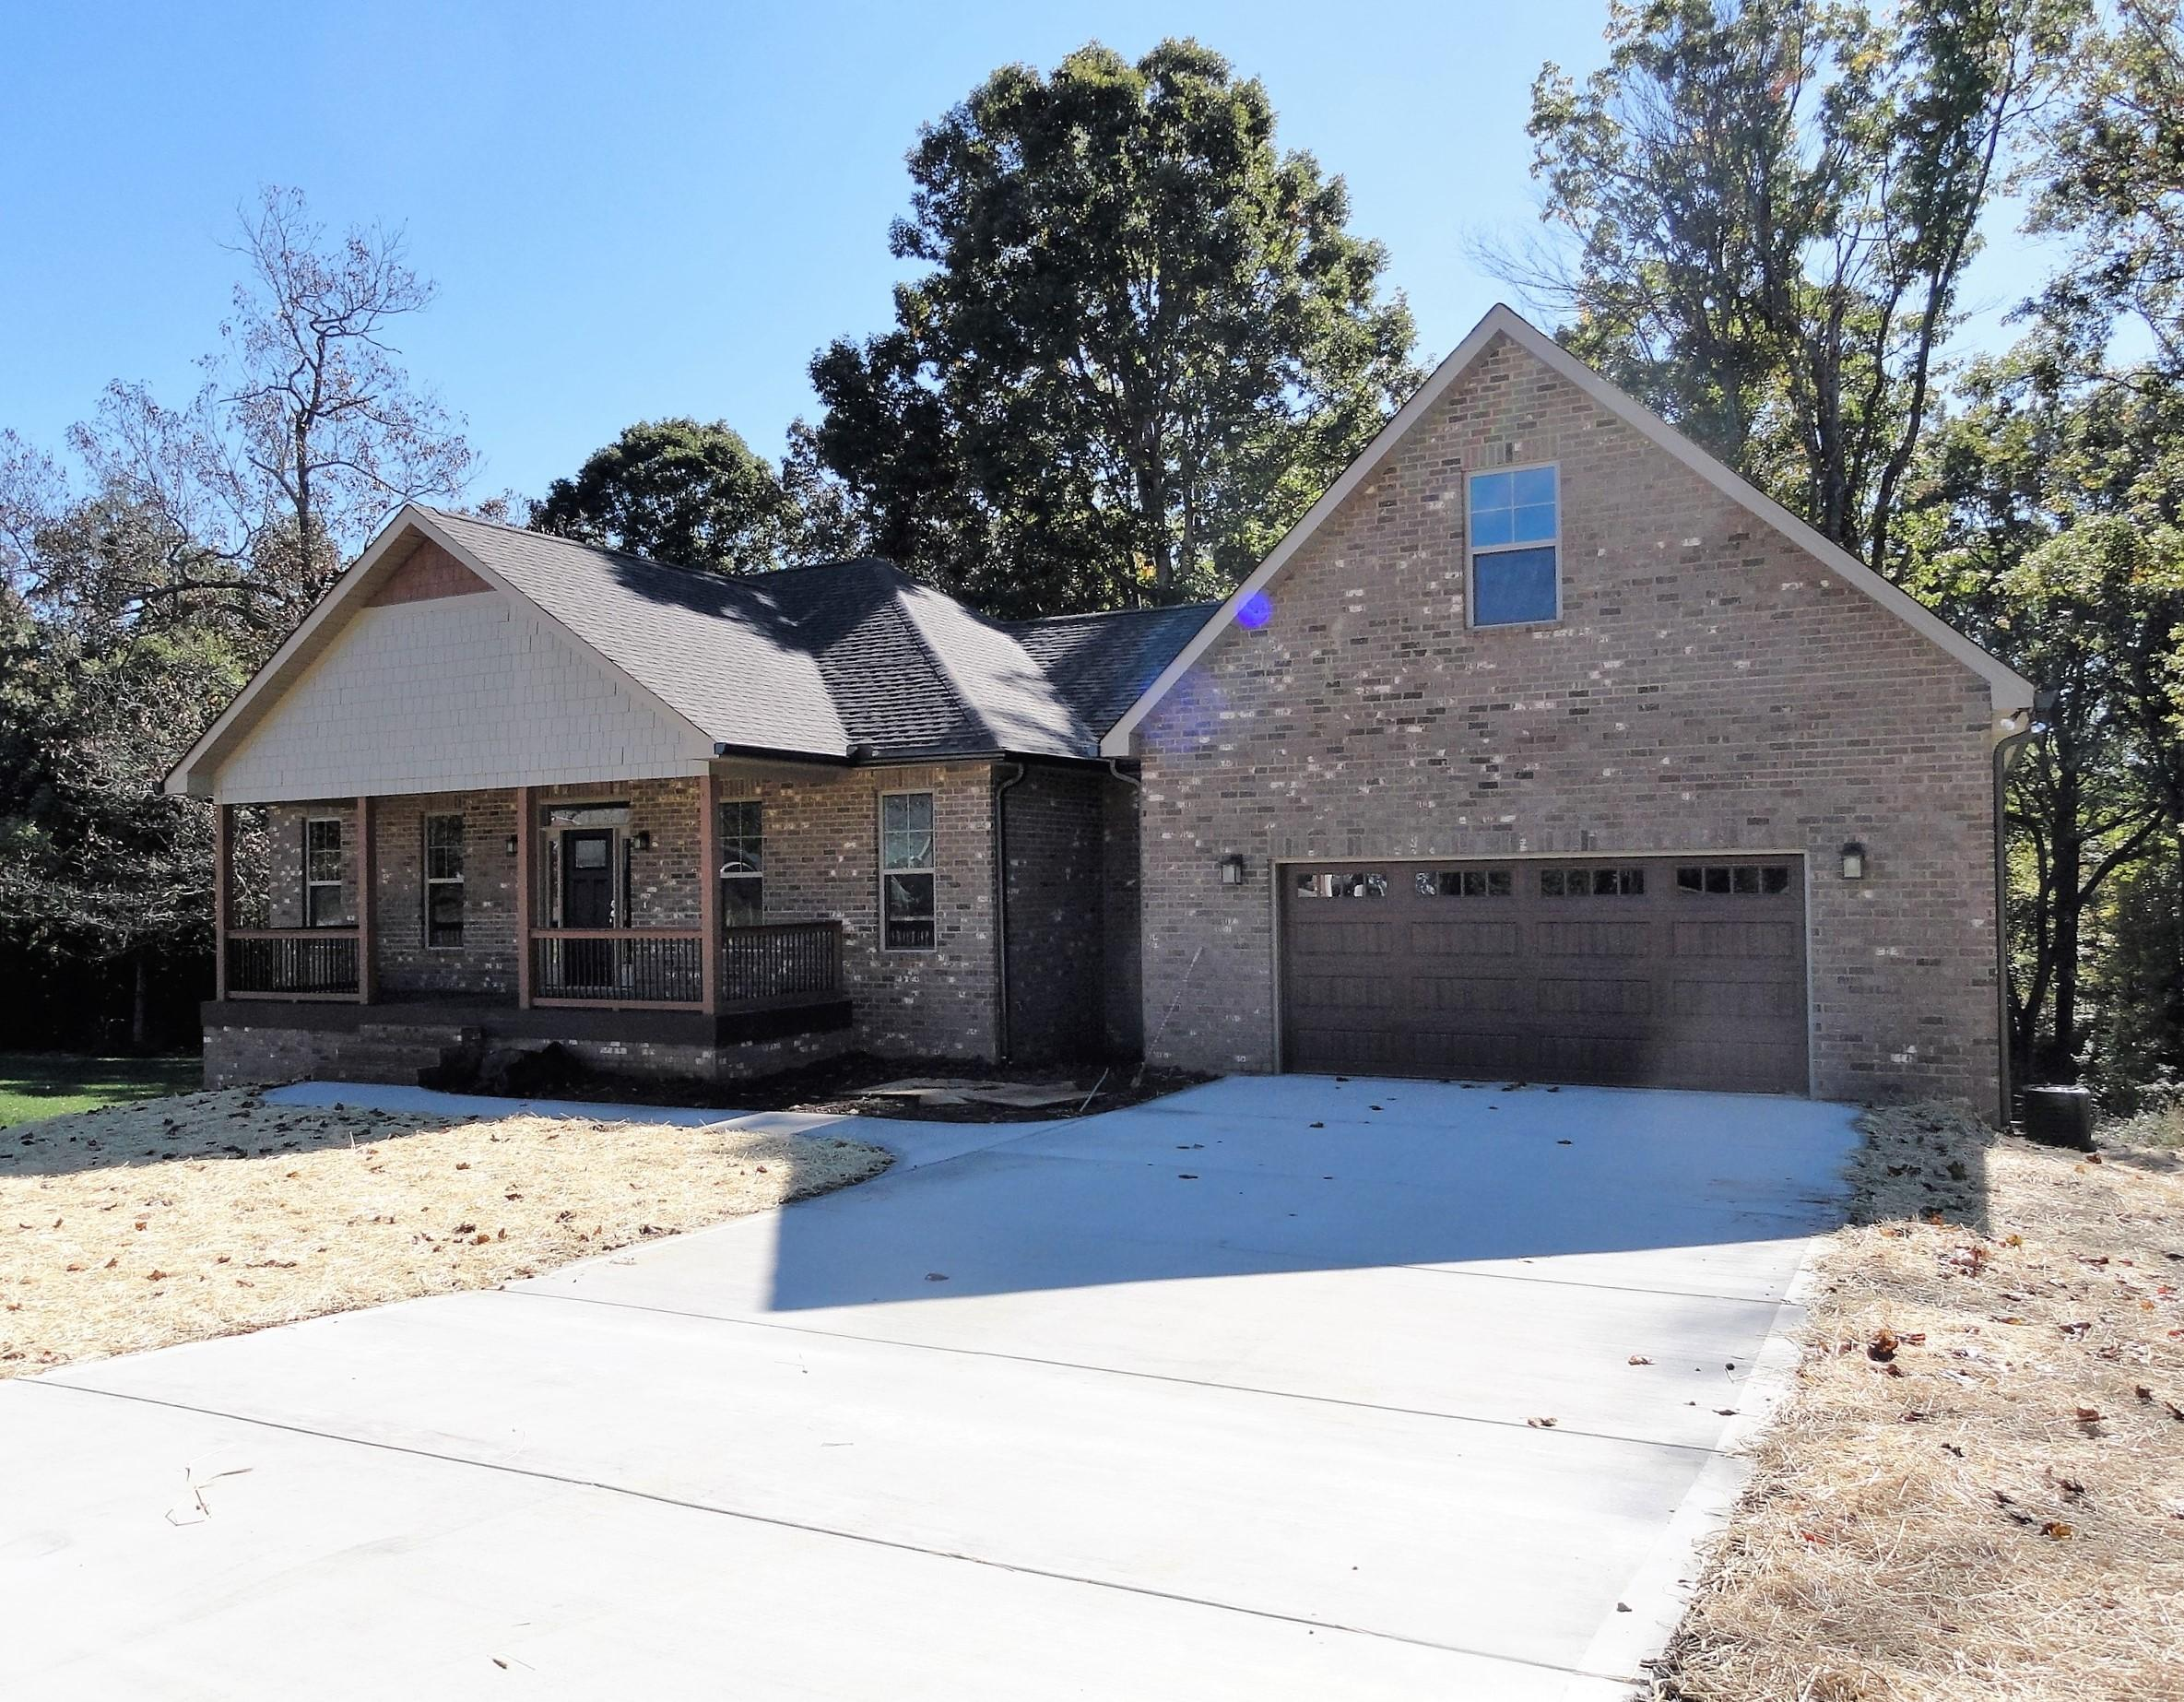 1035 Houston Springs Rd, Greenback, TN 37742